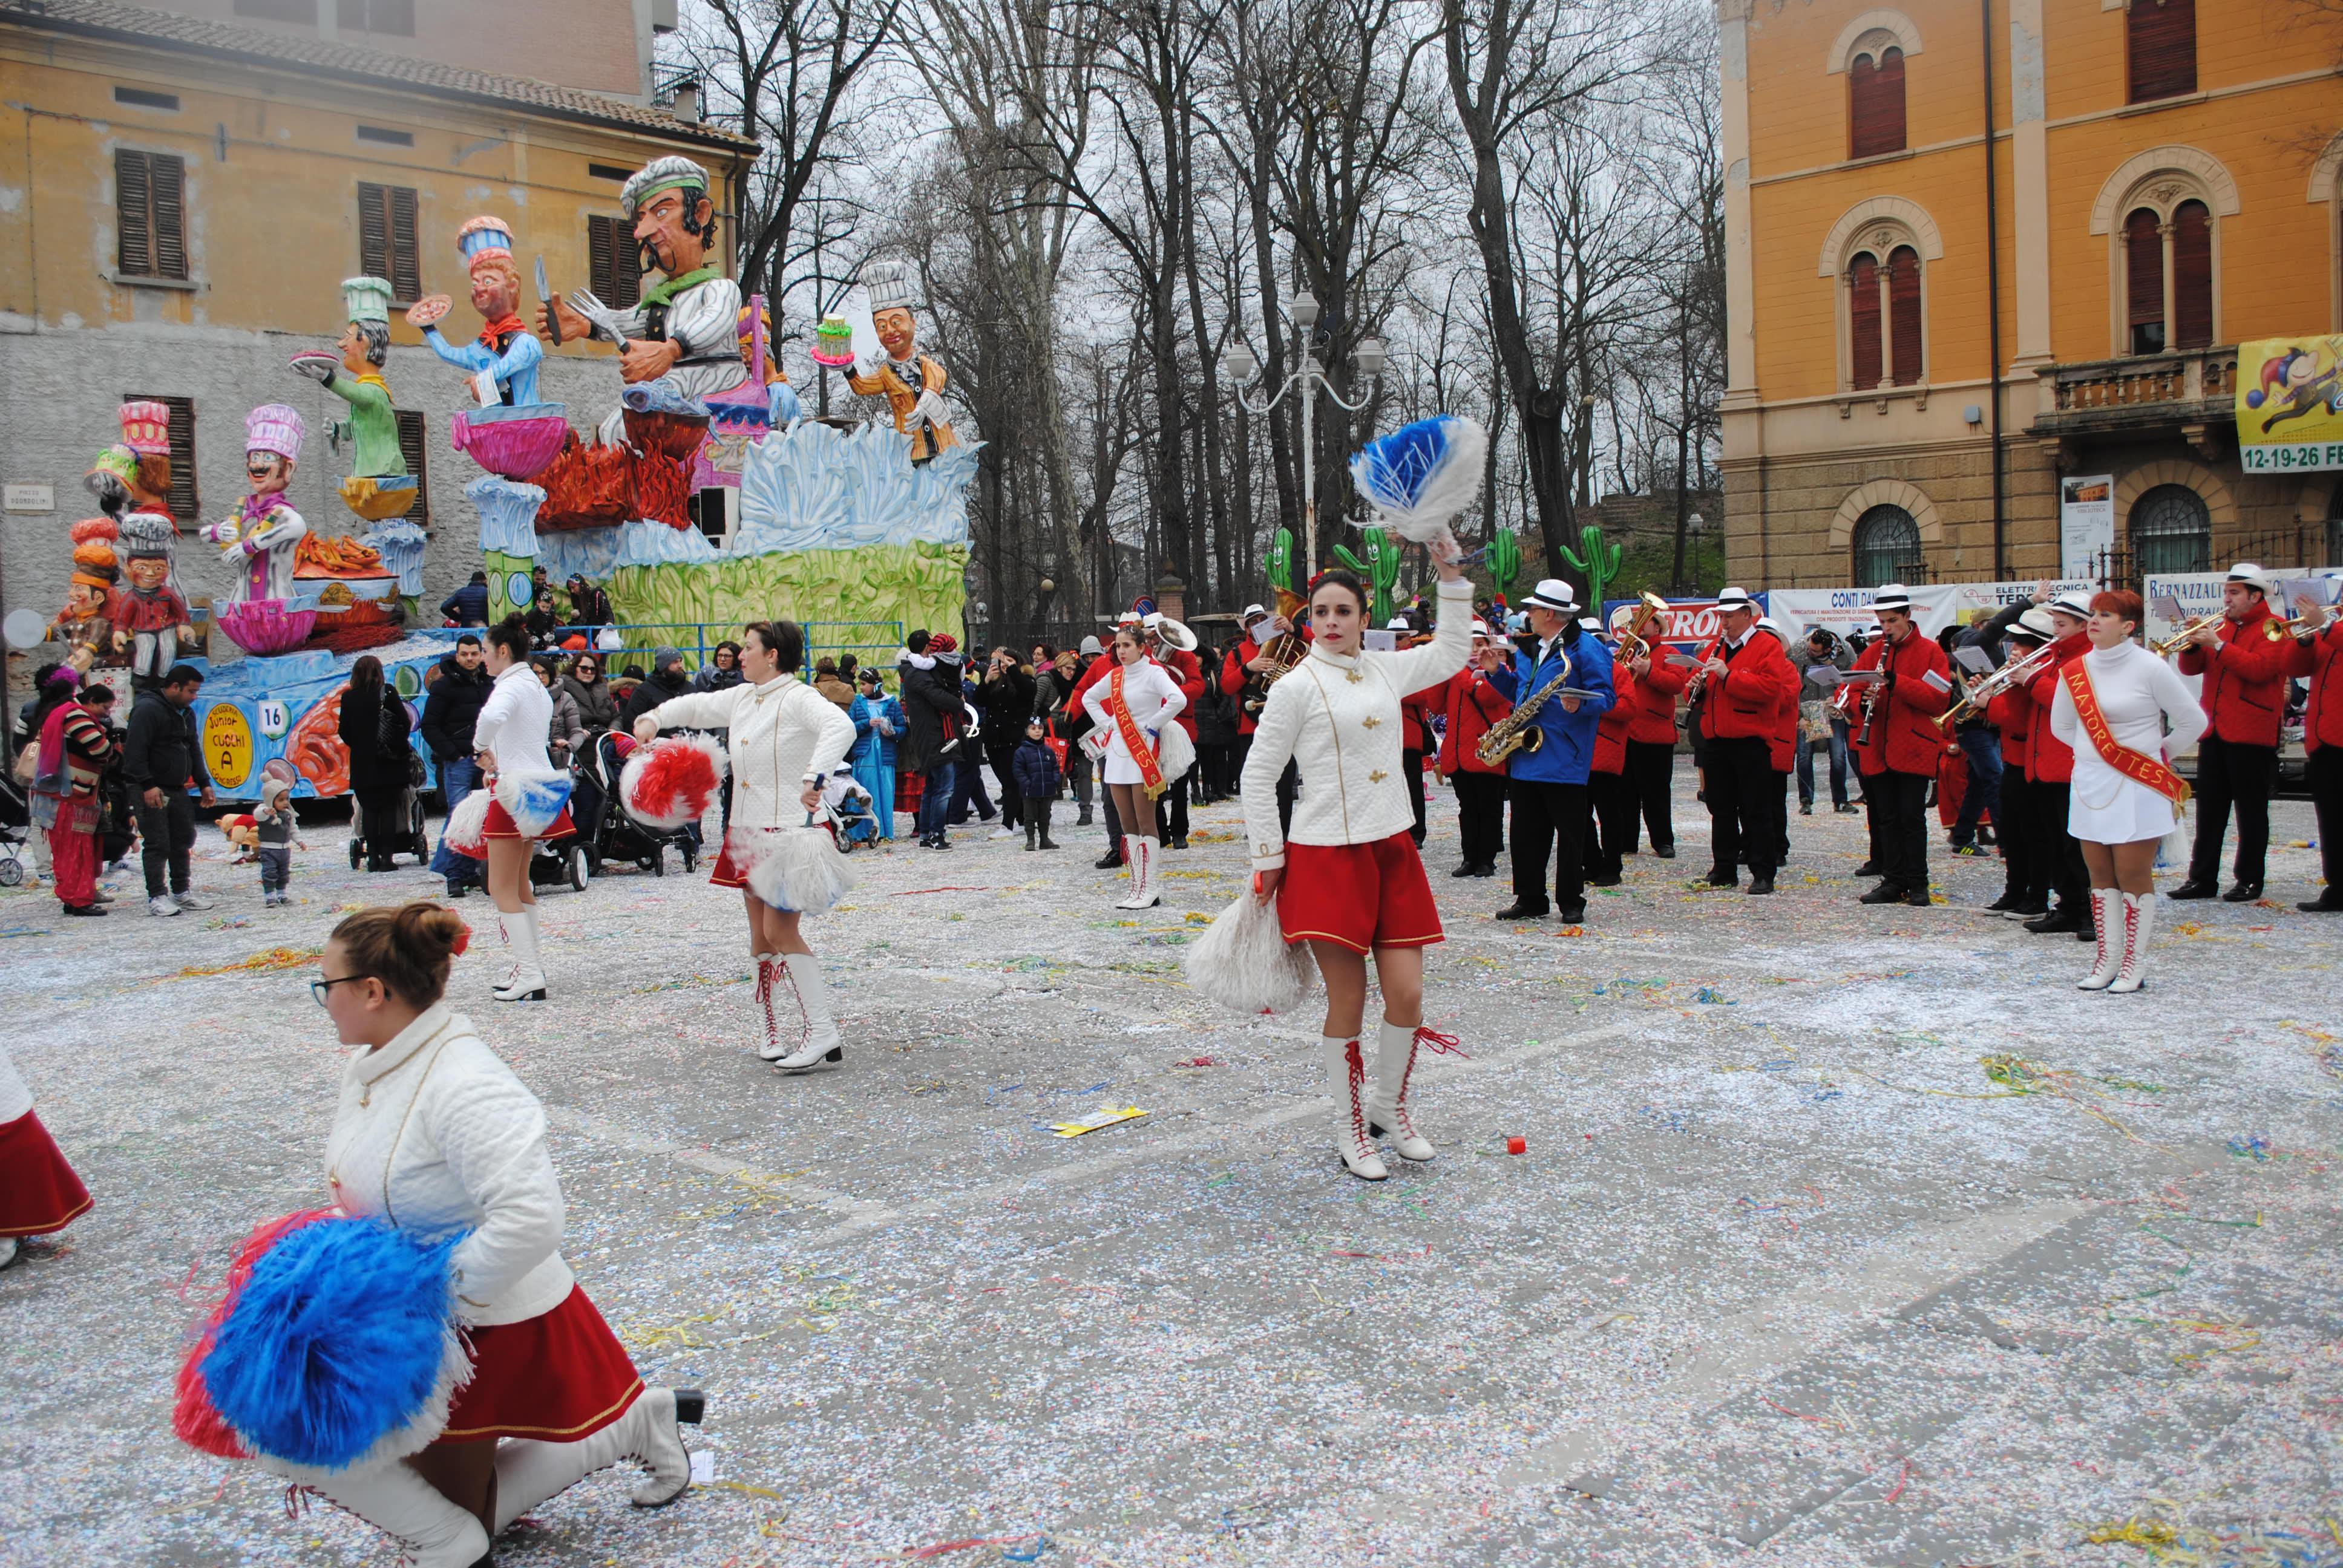 FESTE E SFILATE, OGNI EVENTO VALE